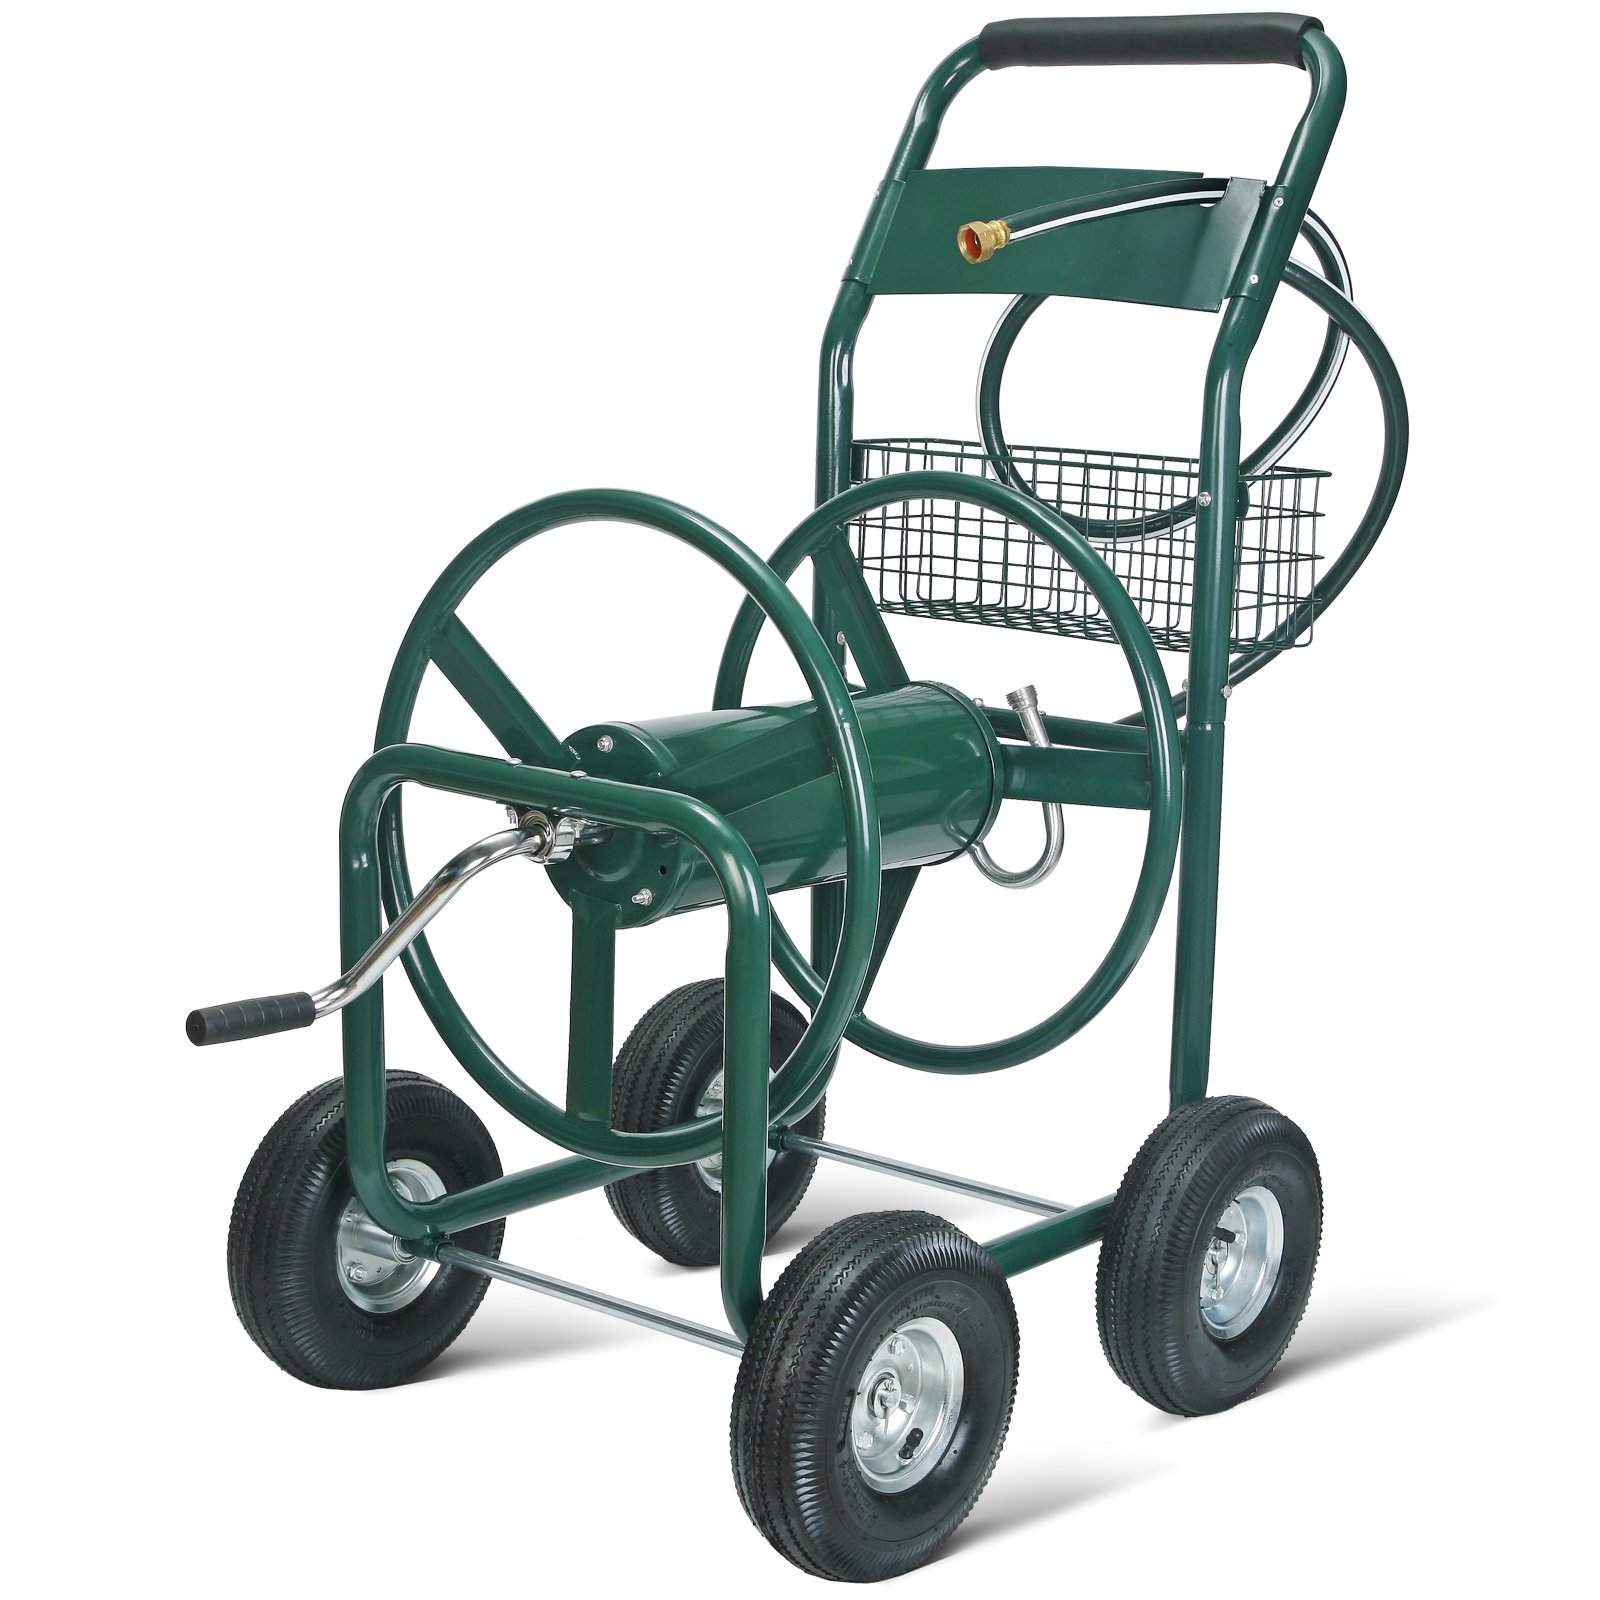 UenJoy Garden Water Hose Reel Cart 300FT Outdoor Heavy Duty Yard Water Planting Green